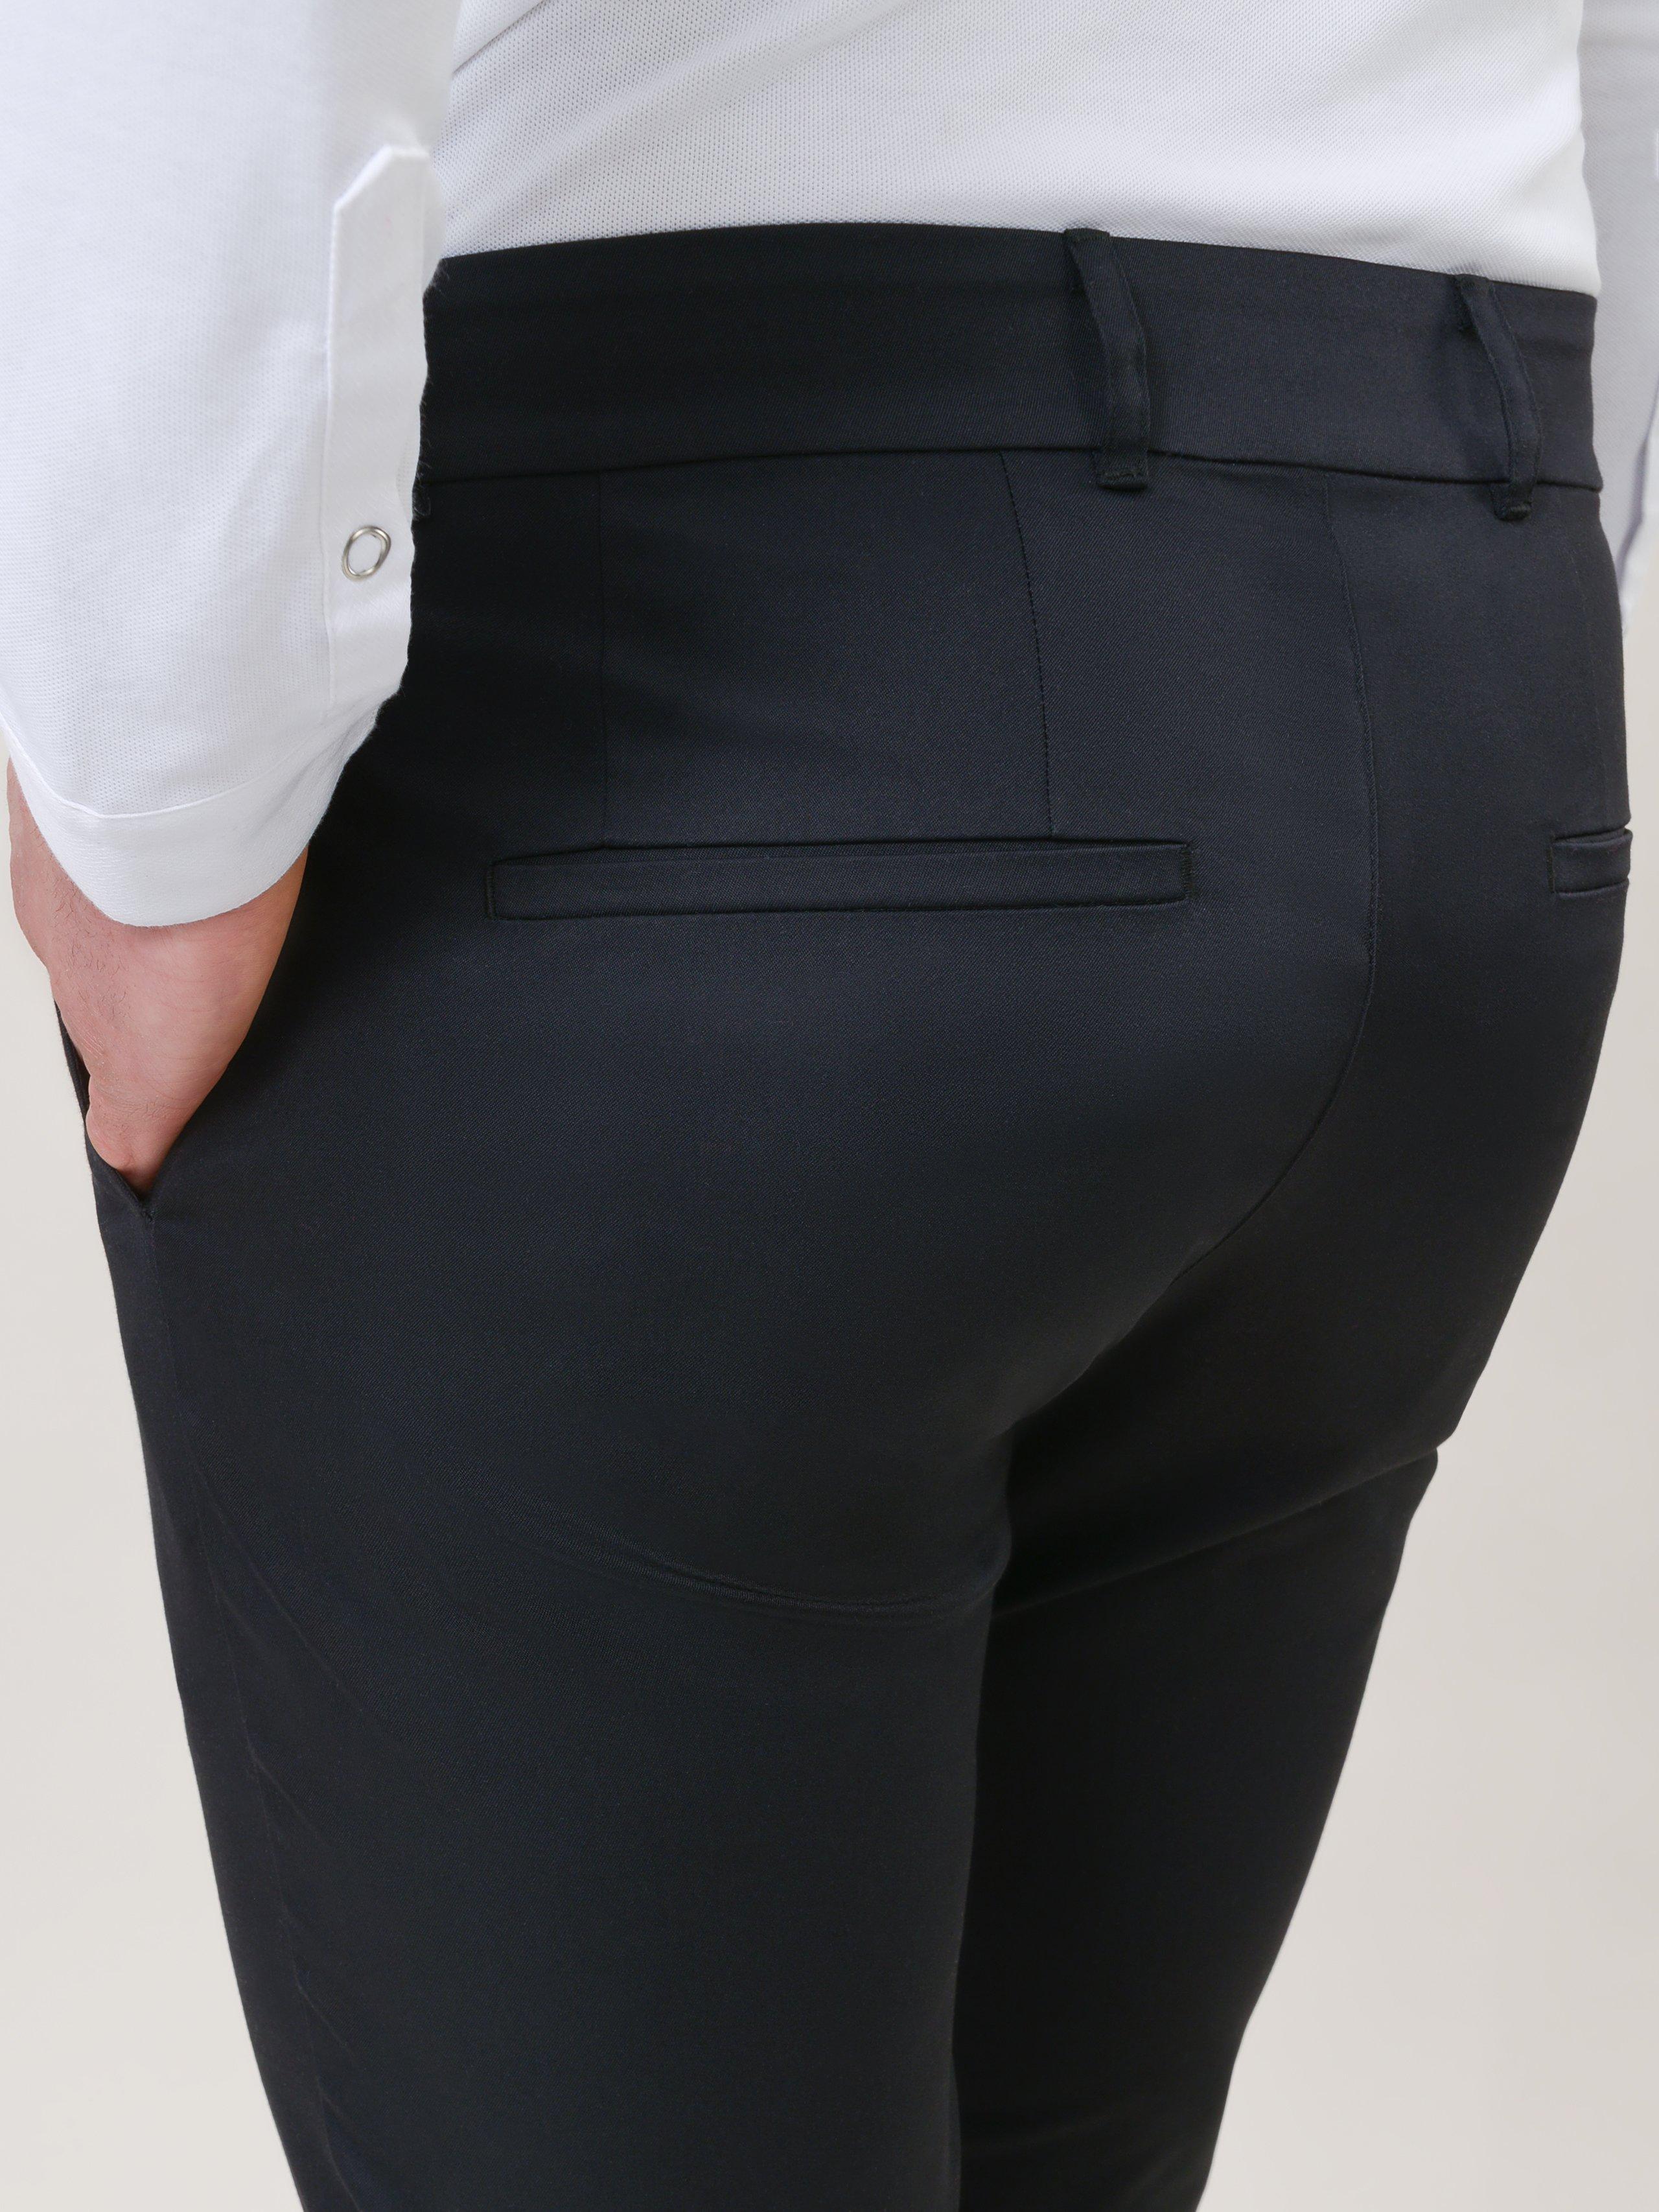 Pants Tokyo Black